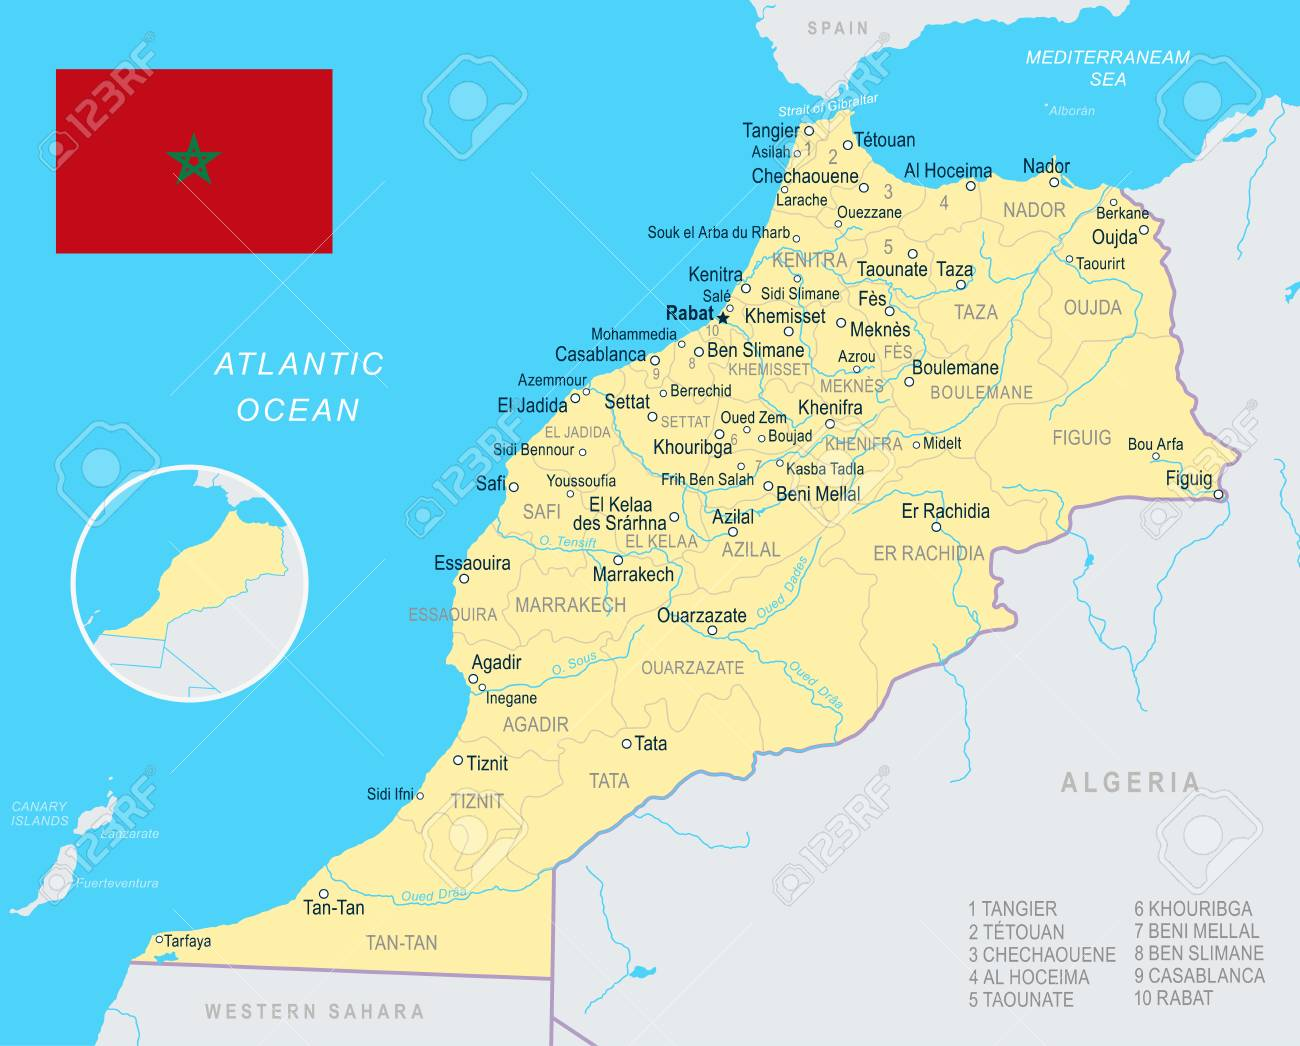 Morocco map and flag - vector illustration on saudi arabia map, angola map, ghana map, egypt map, europe map, sierra leone map, algeria map, mali map, mexico map, malawi map, cameroon map, mauritania map, liberia map, senegal map, moldova map, chad map, italy map, nigeria map, brazil map, japan map, spain map, kenya map, india map, iraq map, rwanda map, lesotho map, israel map, south africa map, eritrea map, mauritius map, namibia map, tunisia map, mozambique map, poland map, libya map, france map, western hemisphere map, niger map,